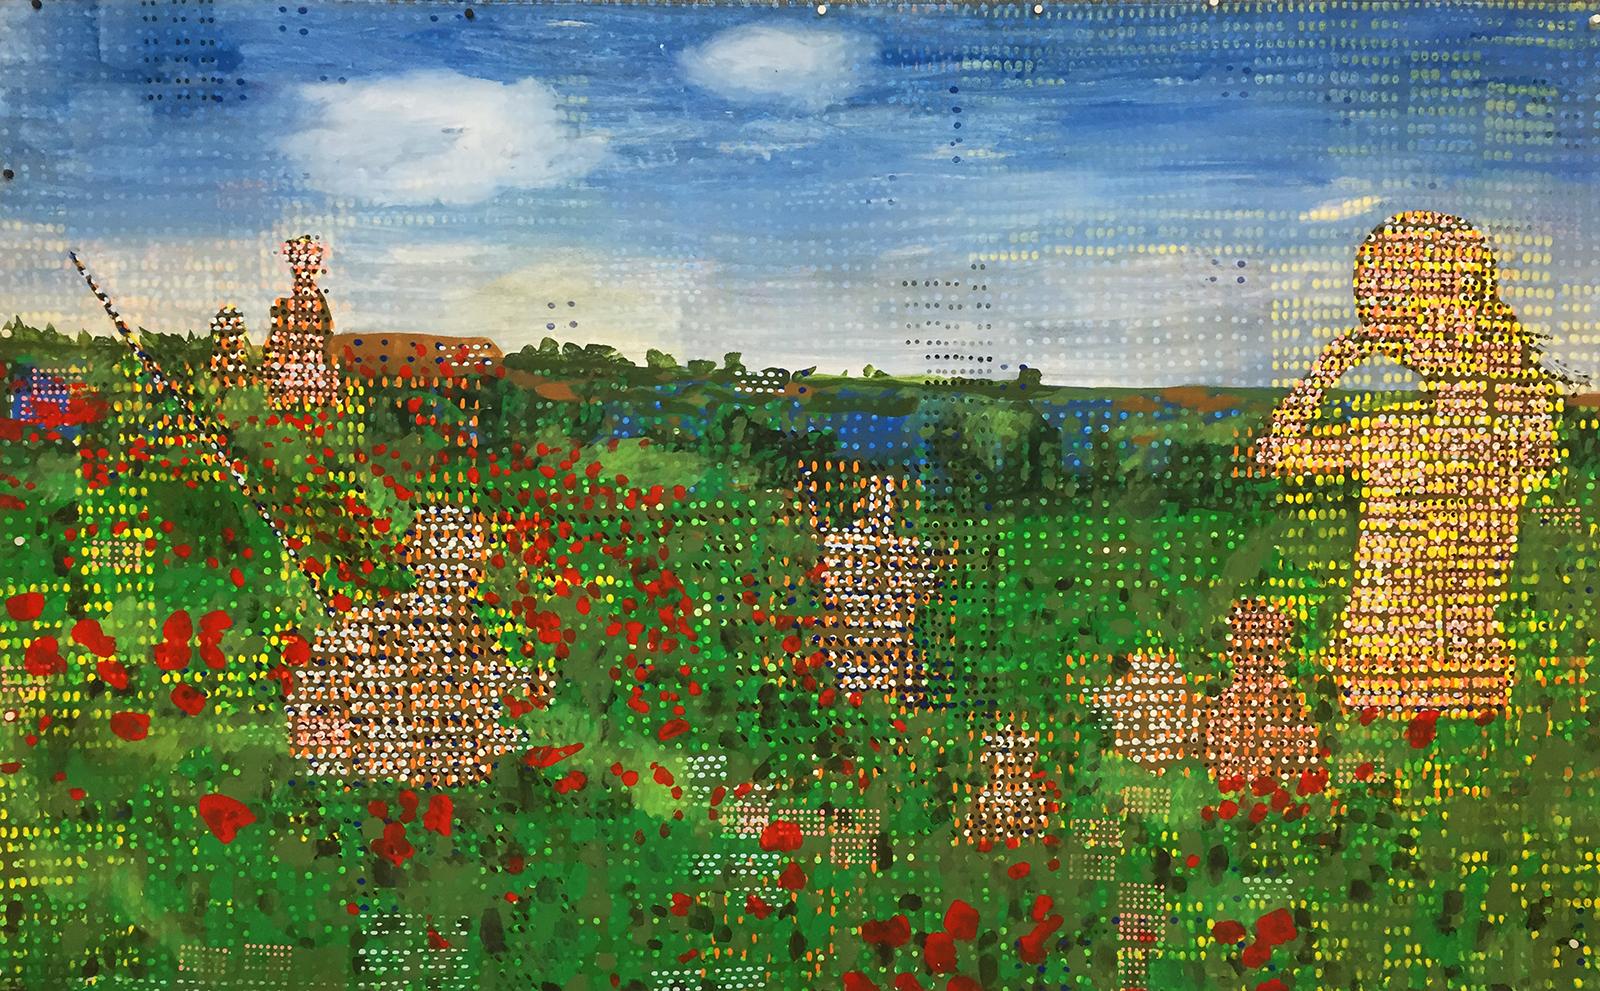 "Jeff Ostergren, Poppy Fields (Afghanistan, Allergies, Argenteuil), (2019). Oxycontin, Viagra, Claritin, Luvox, Strattera, Jolessa, Zoloft, Sudafed, Roundup Weed Killer, and Acrylic on Kevlar Ballistic Fabric, 60"" x 96"""